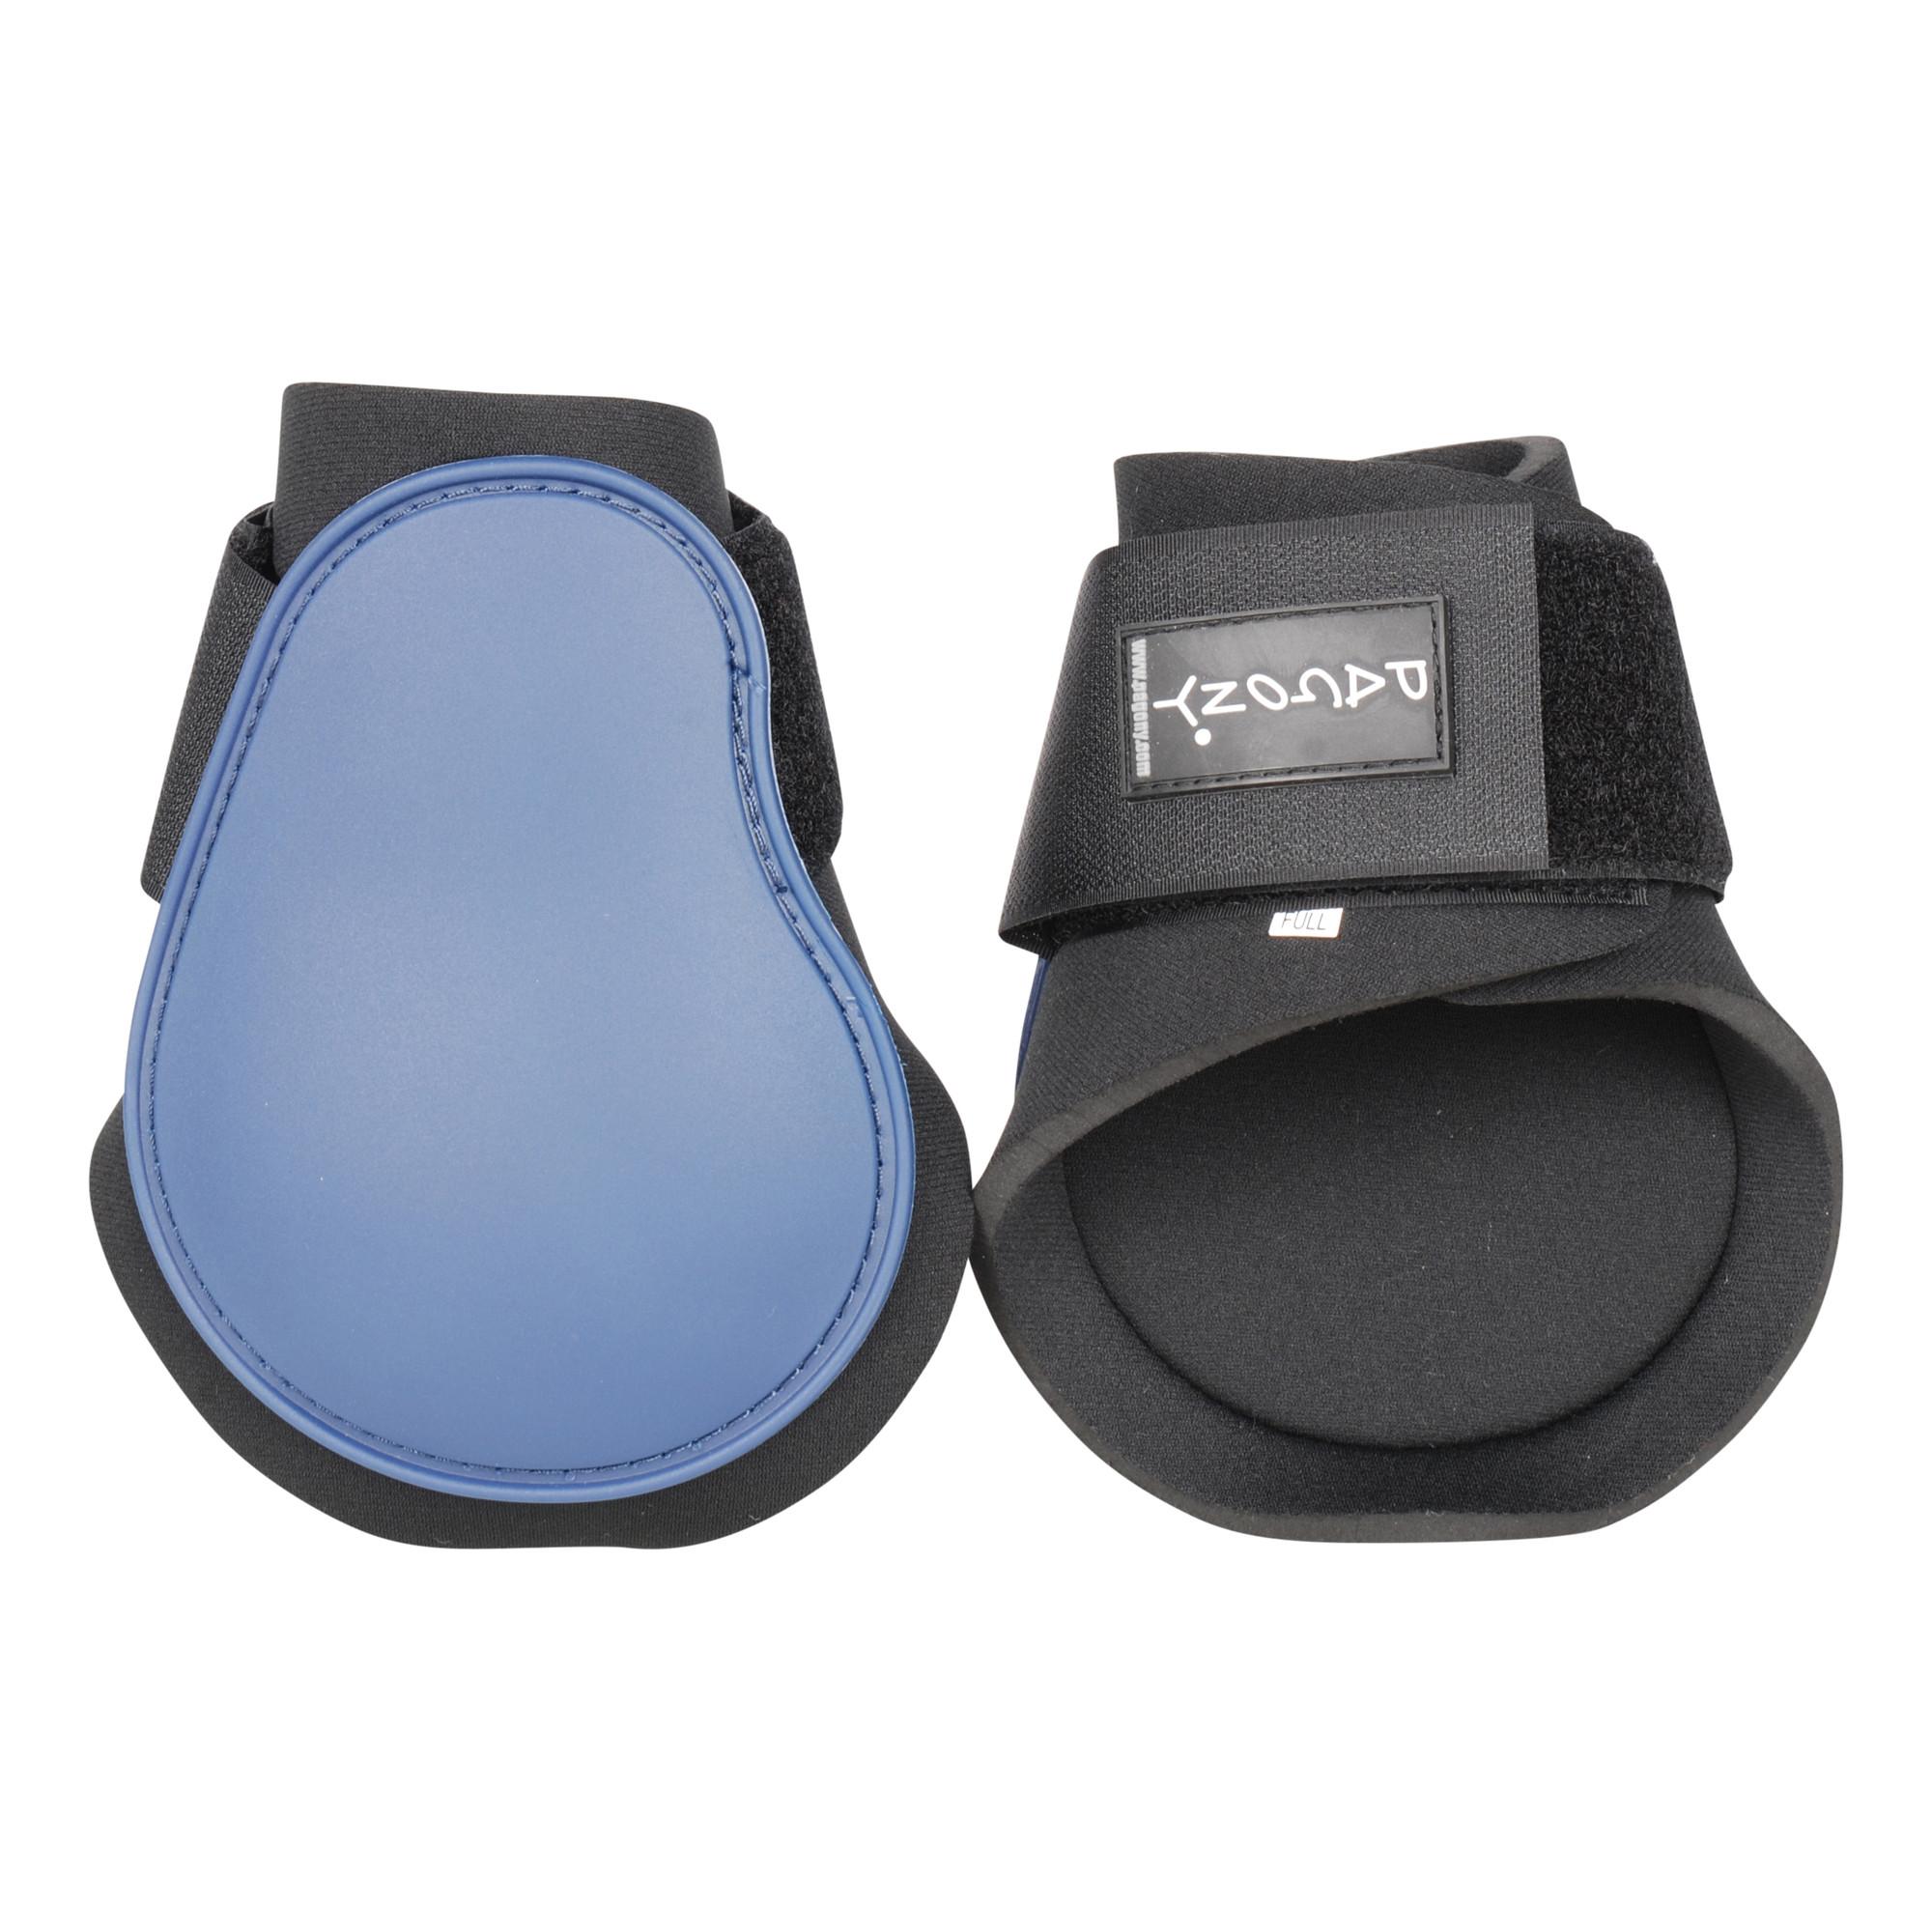 Pagony Velcro kogelbeschermers donkerblauw maat:full